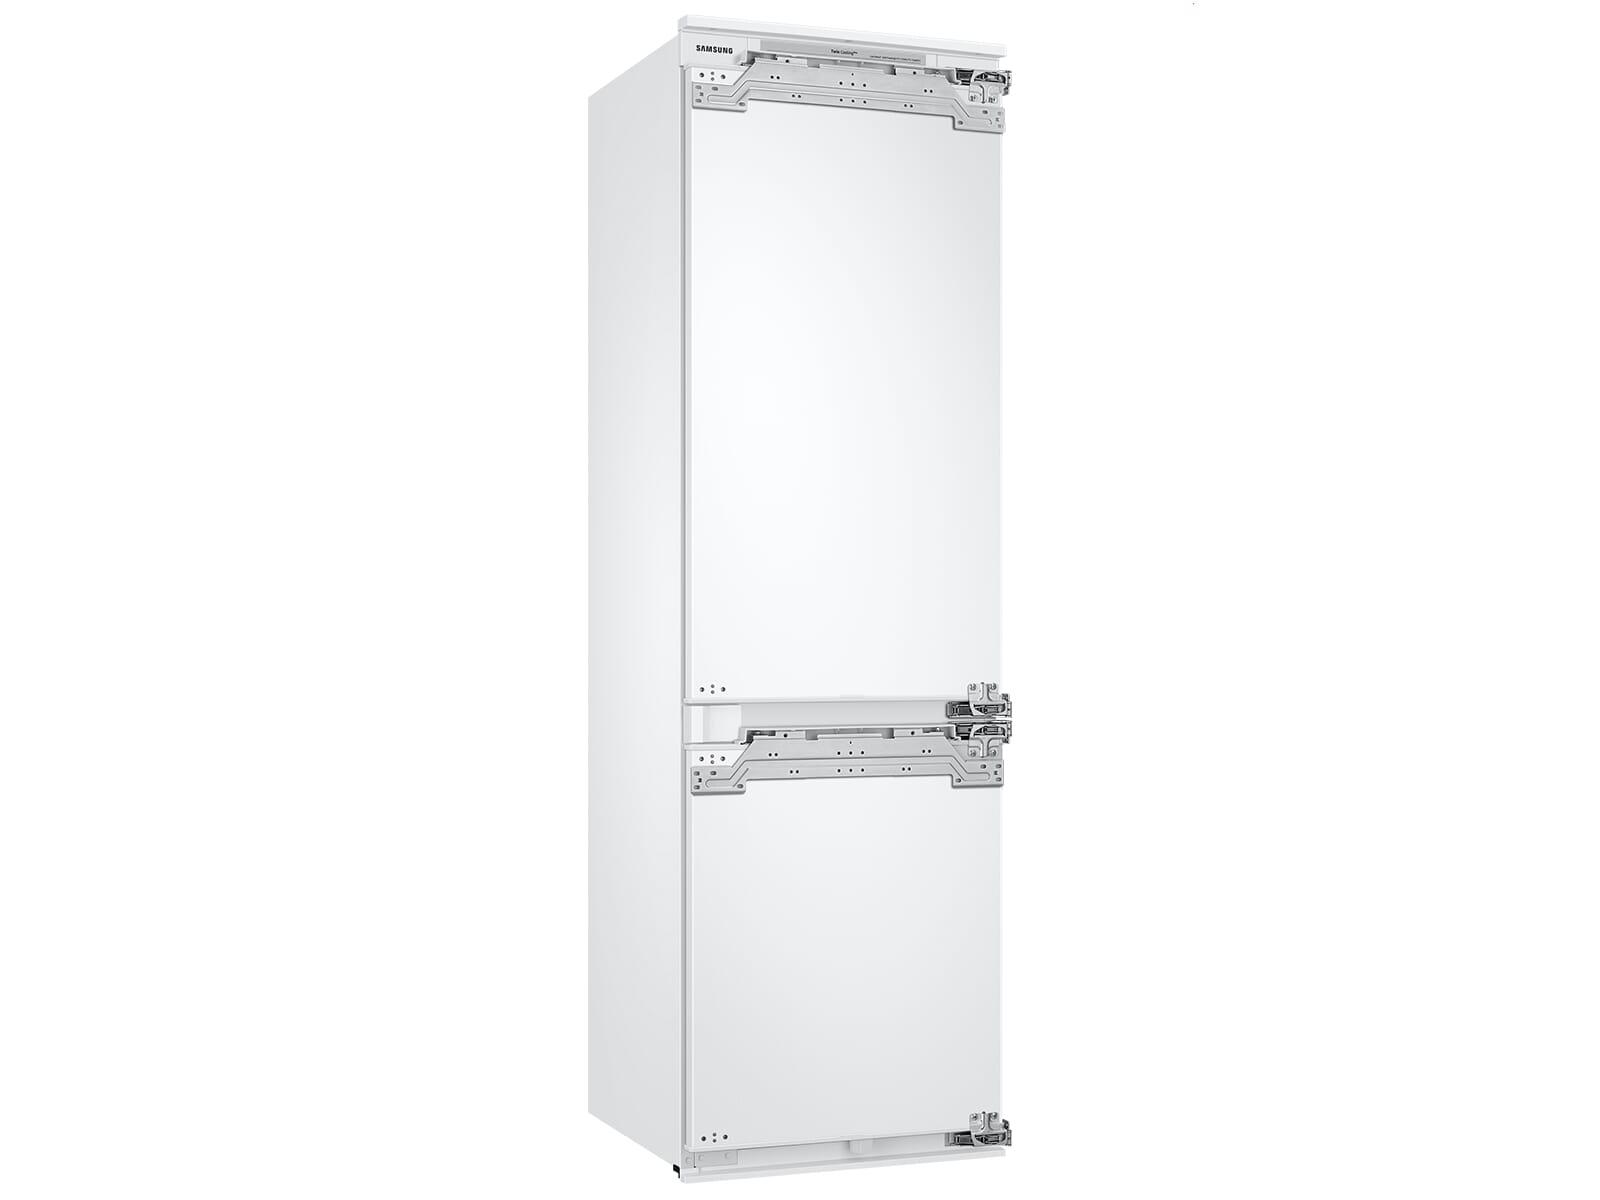 Samsung BRB260187WW/EF Einbau-Kühl-Gefrierkombination